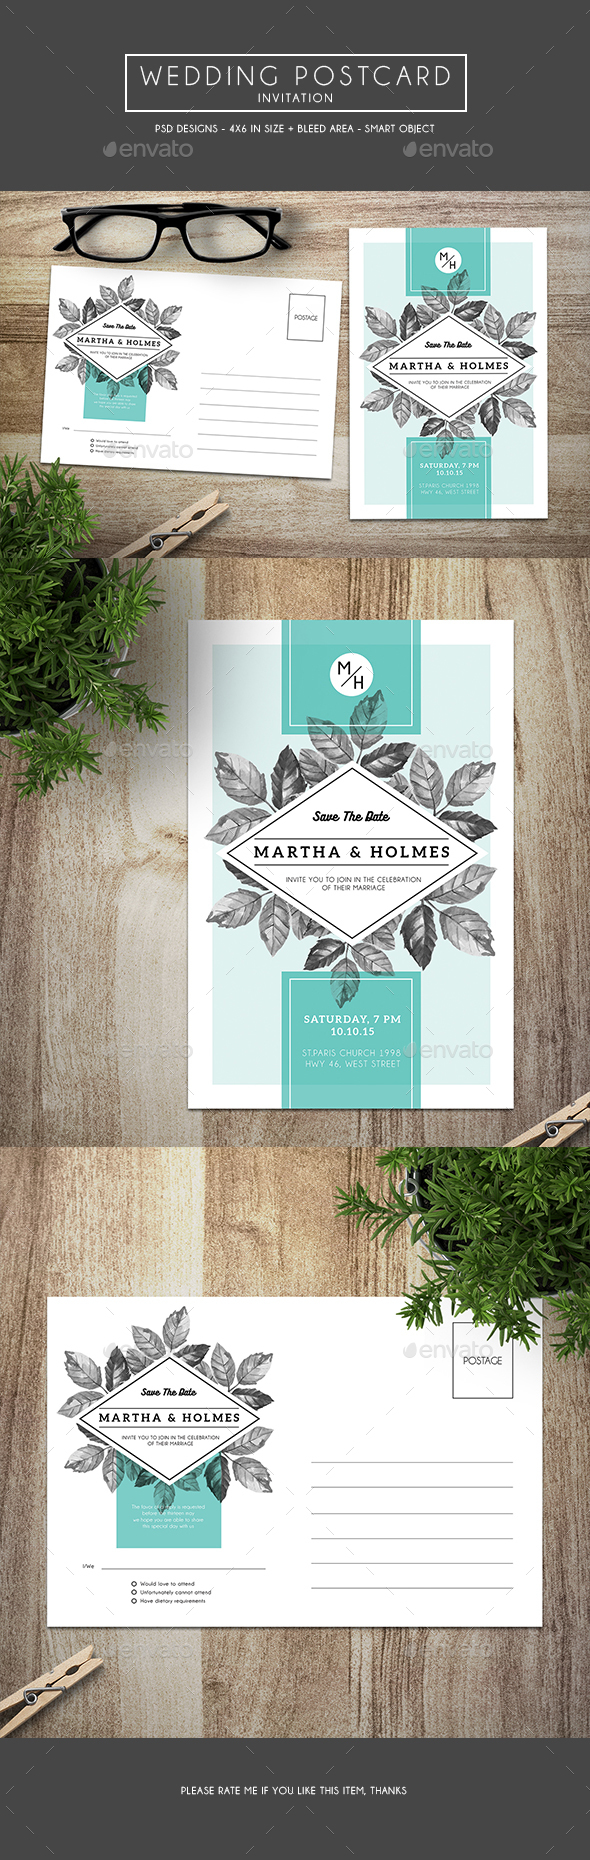 Wedding Postcard Invitation